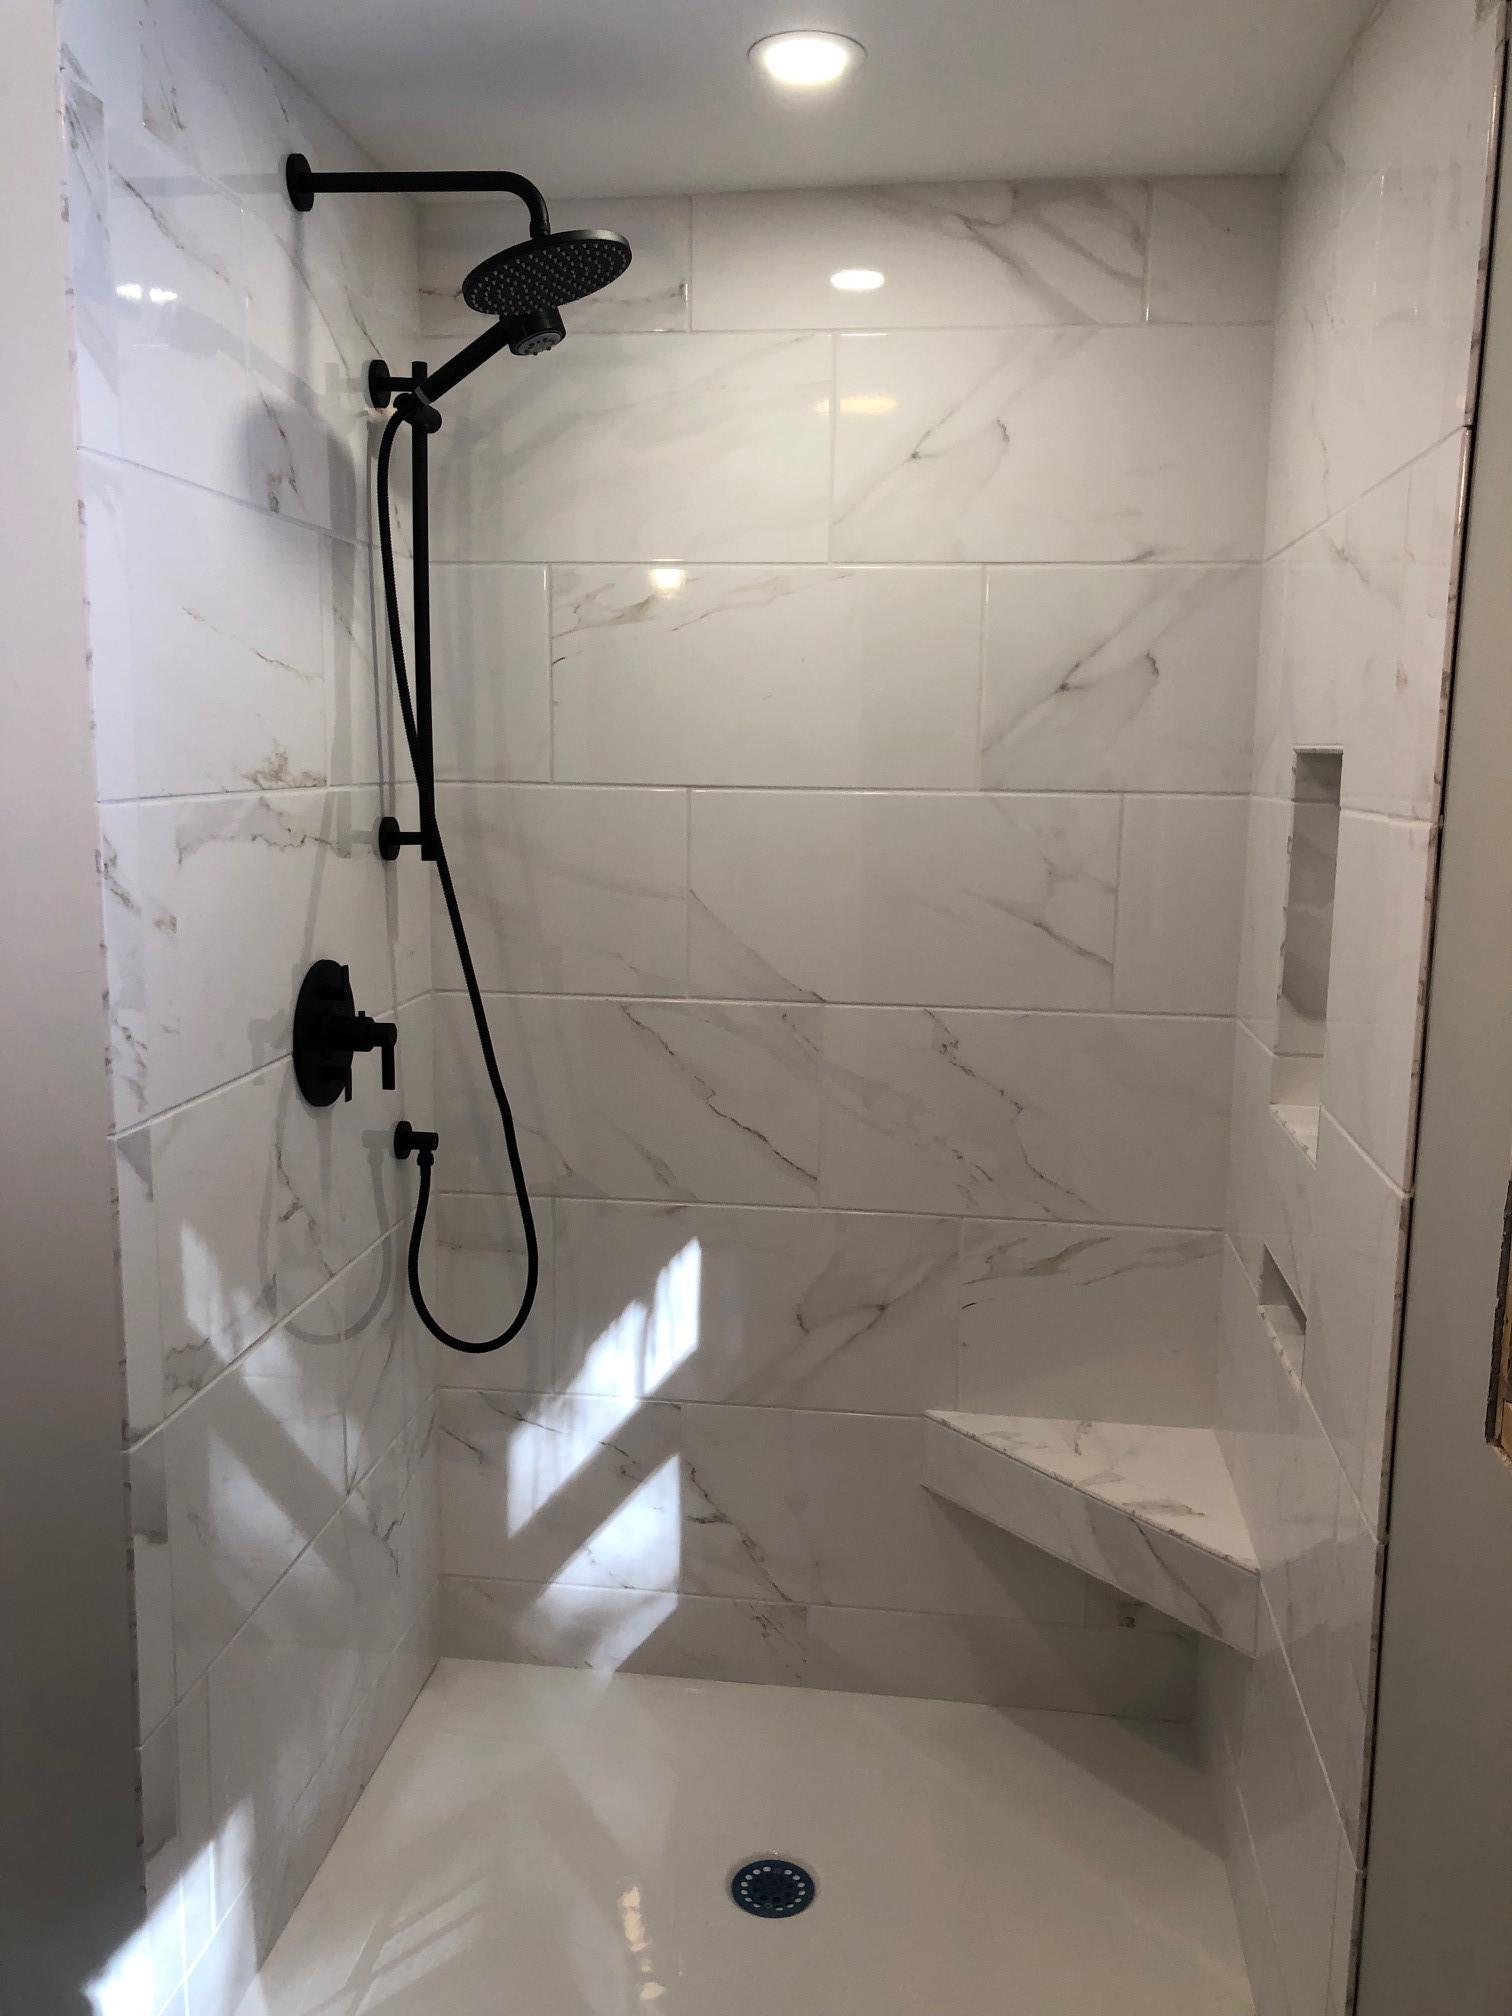 Additional Bathrooms Remodels